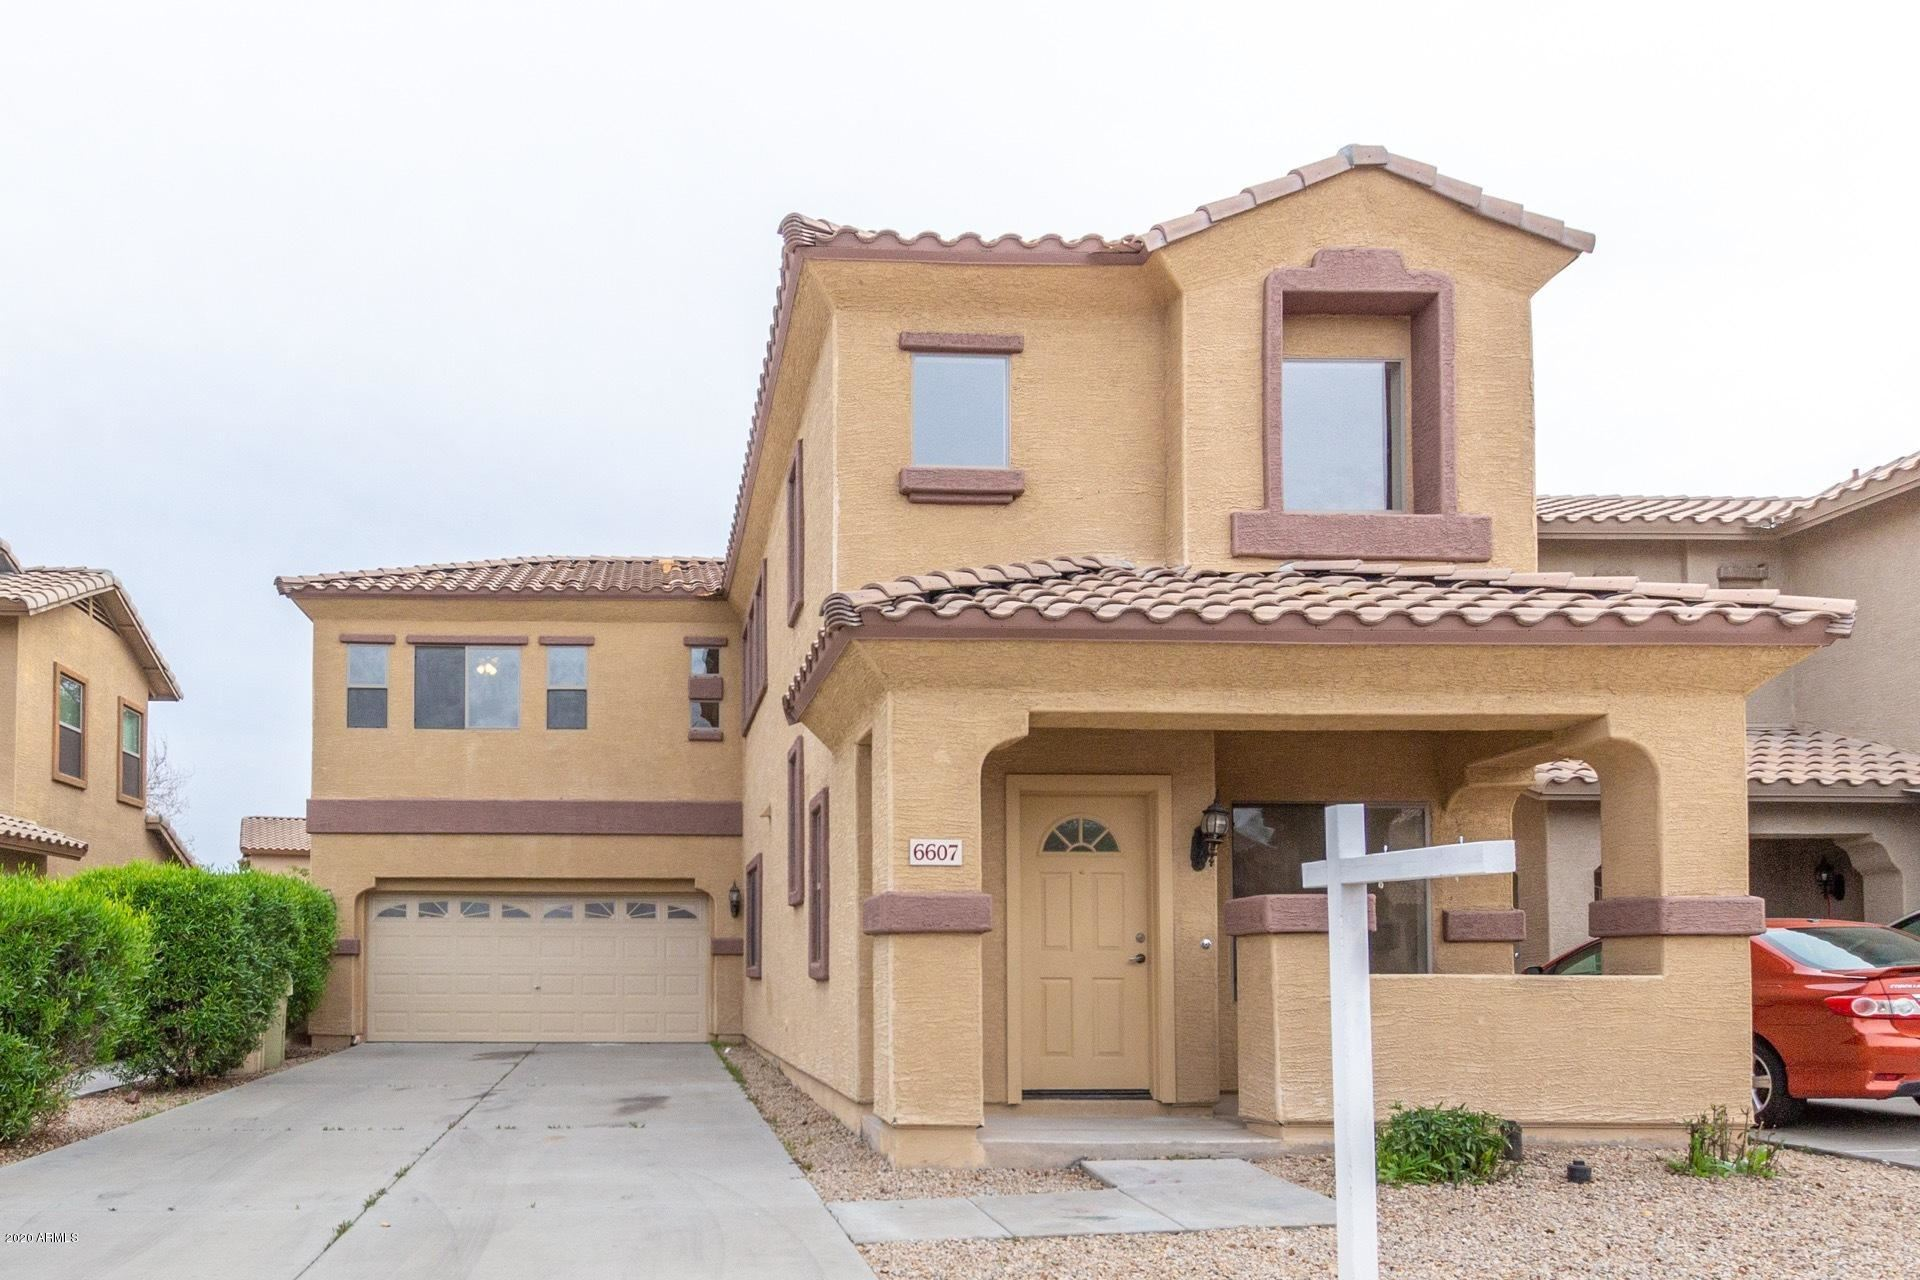 6607 W DESERT HILLS Drive, Glendale, AZ 85304 - #: 6035902